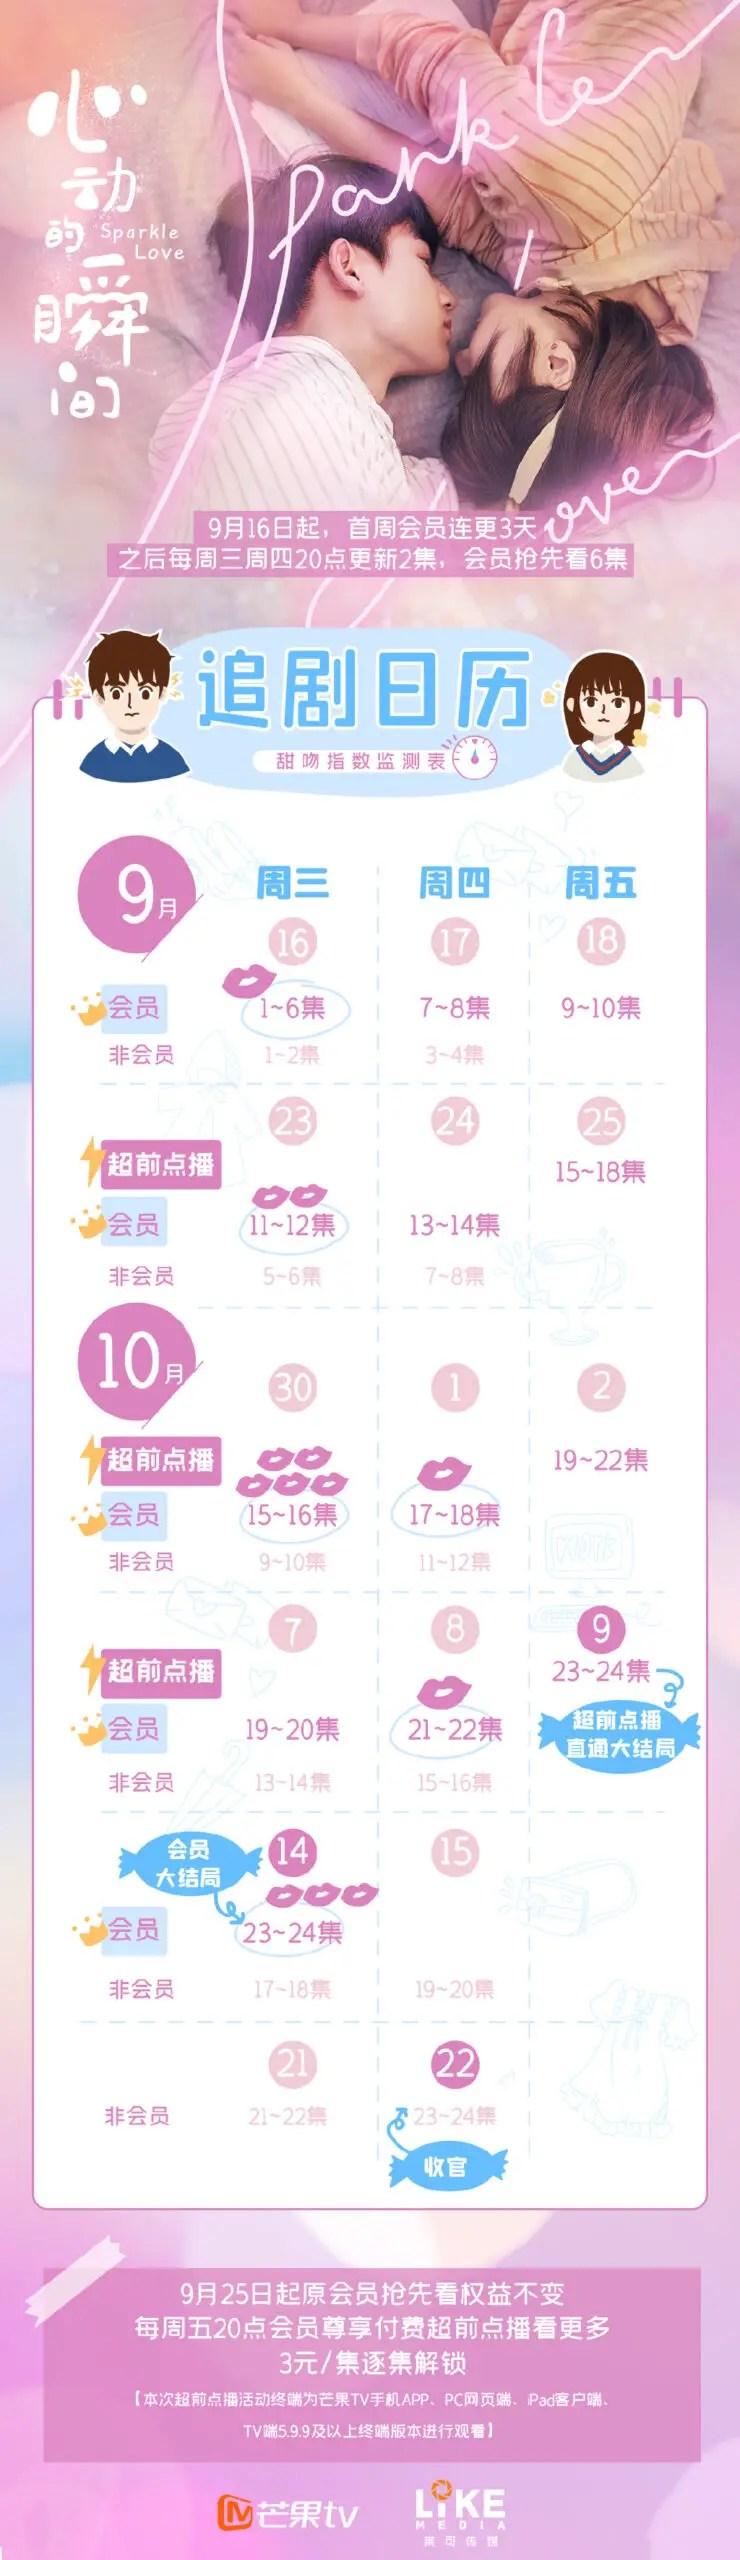 Sparkle Love Chinese Drama Airing Calendar